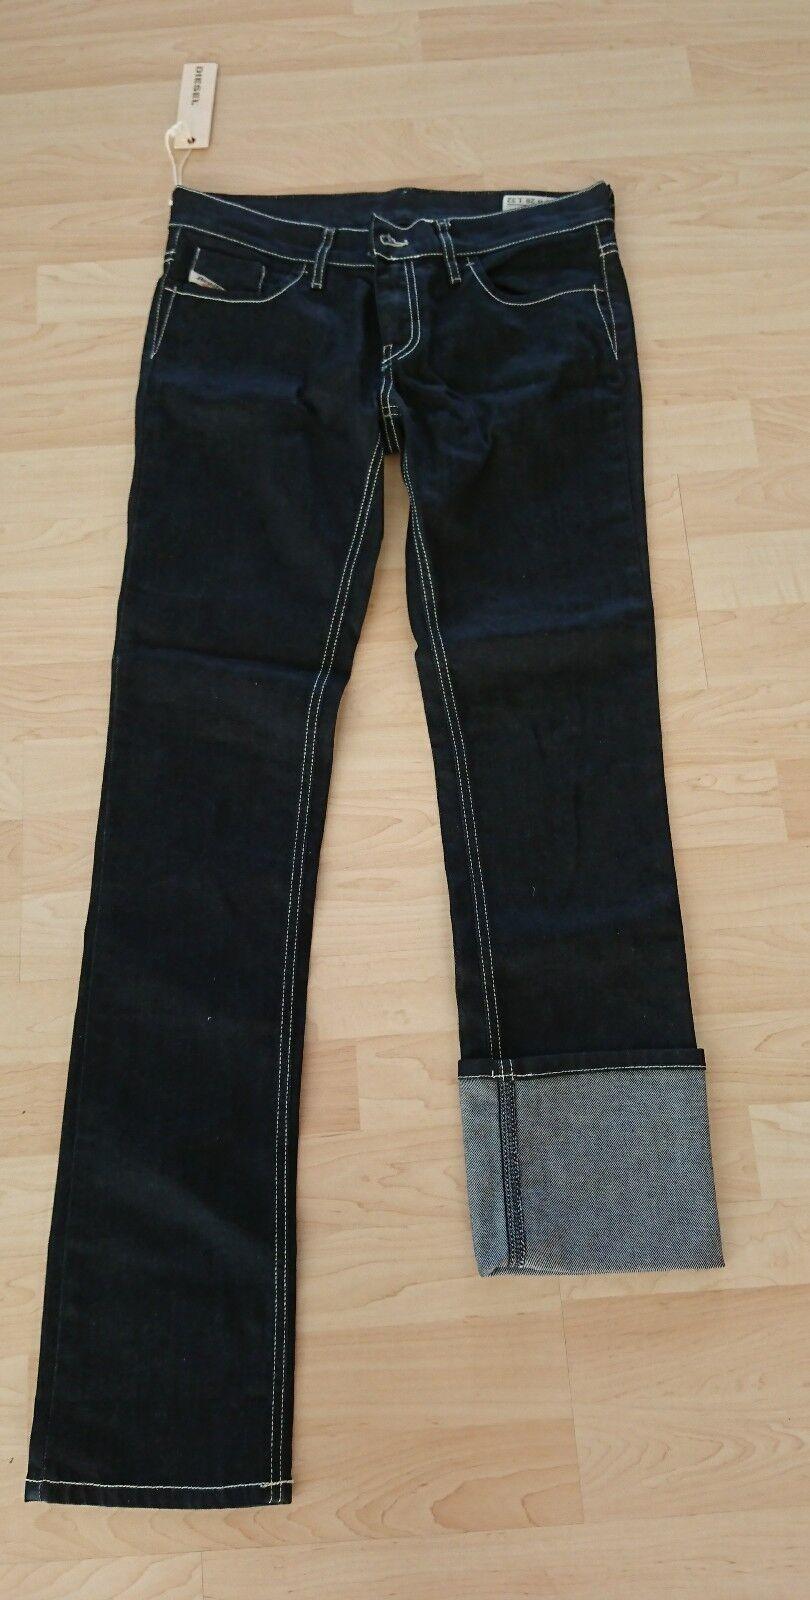 Diesel Jeans, LIV LIV LIV W28 | Feinbearbeitung  a67c24